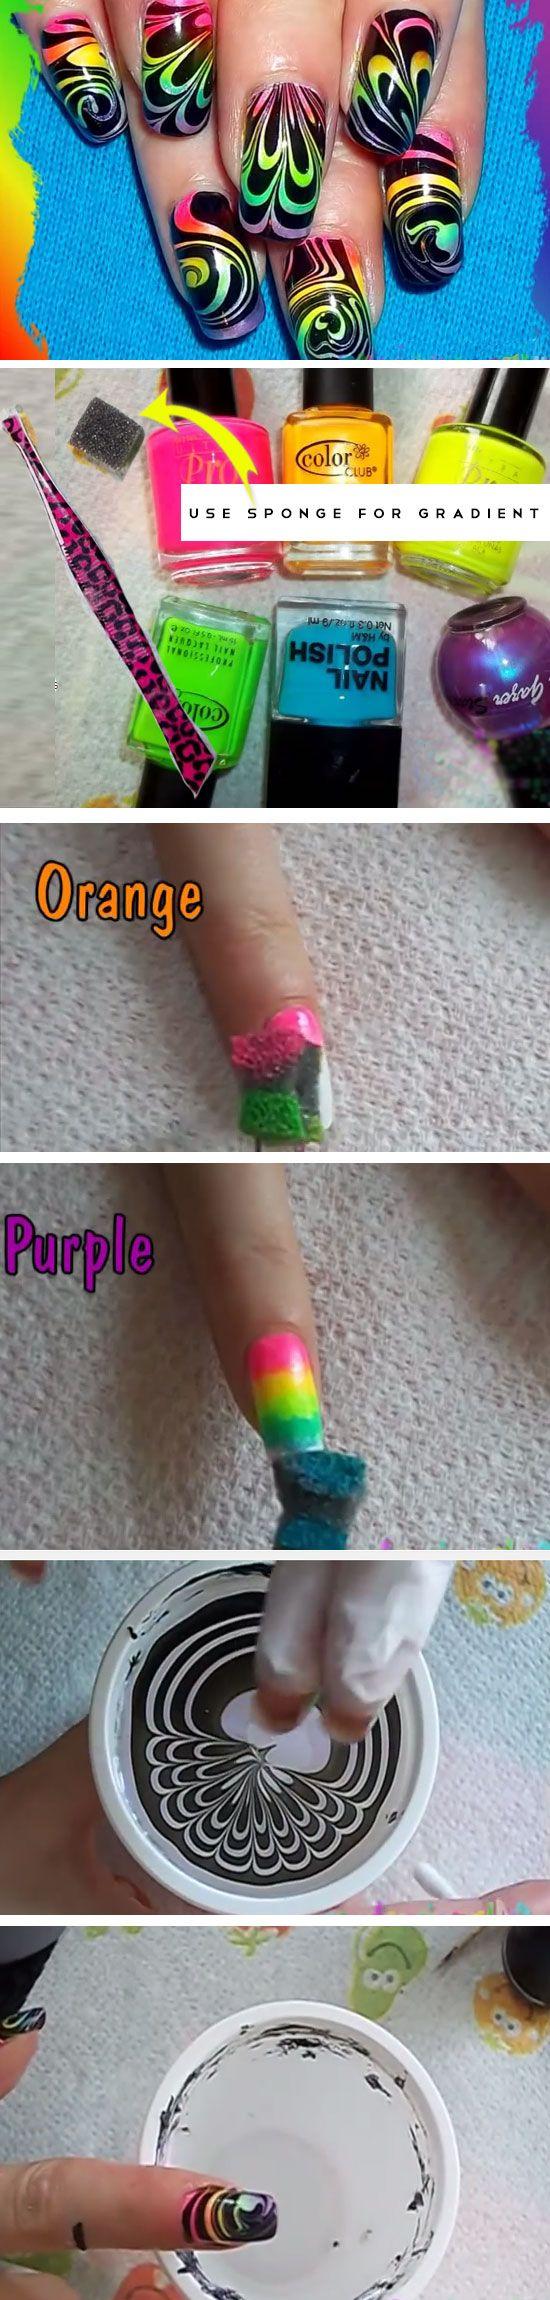 Rainbow Water Marble | Cute Summer Nail Art Ideas for Short Nails